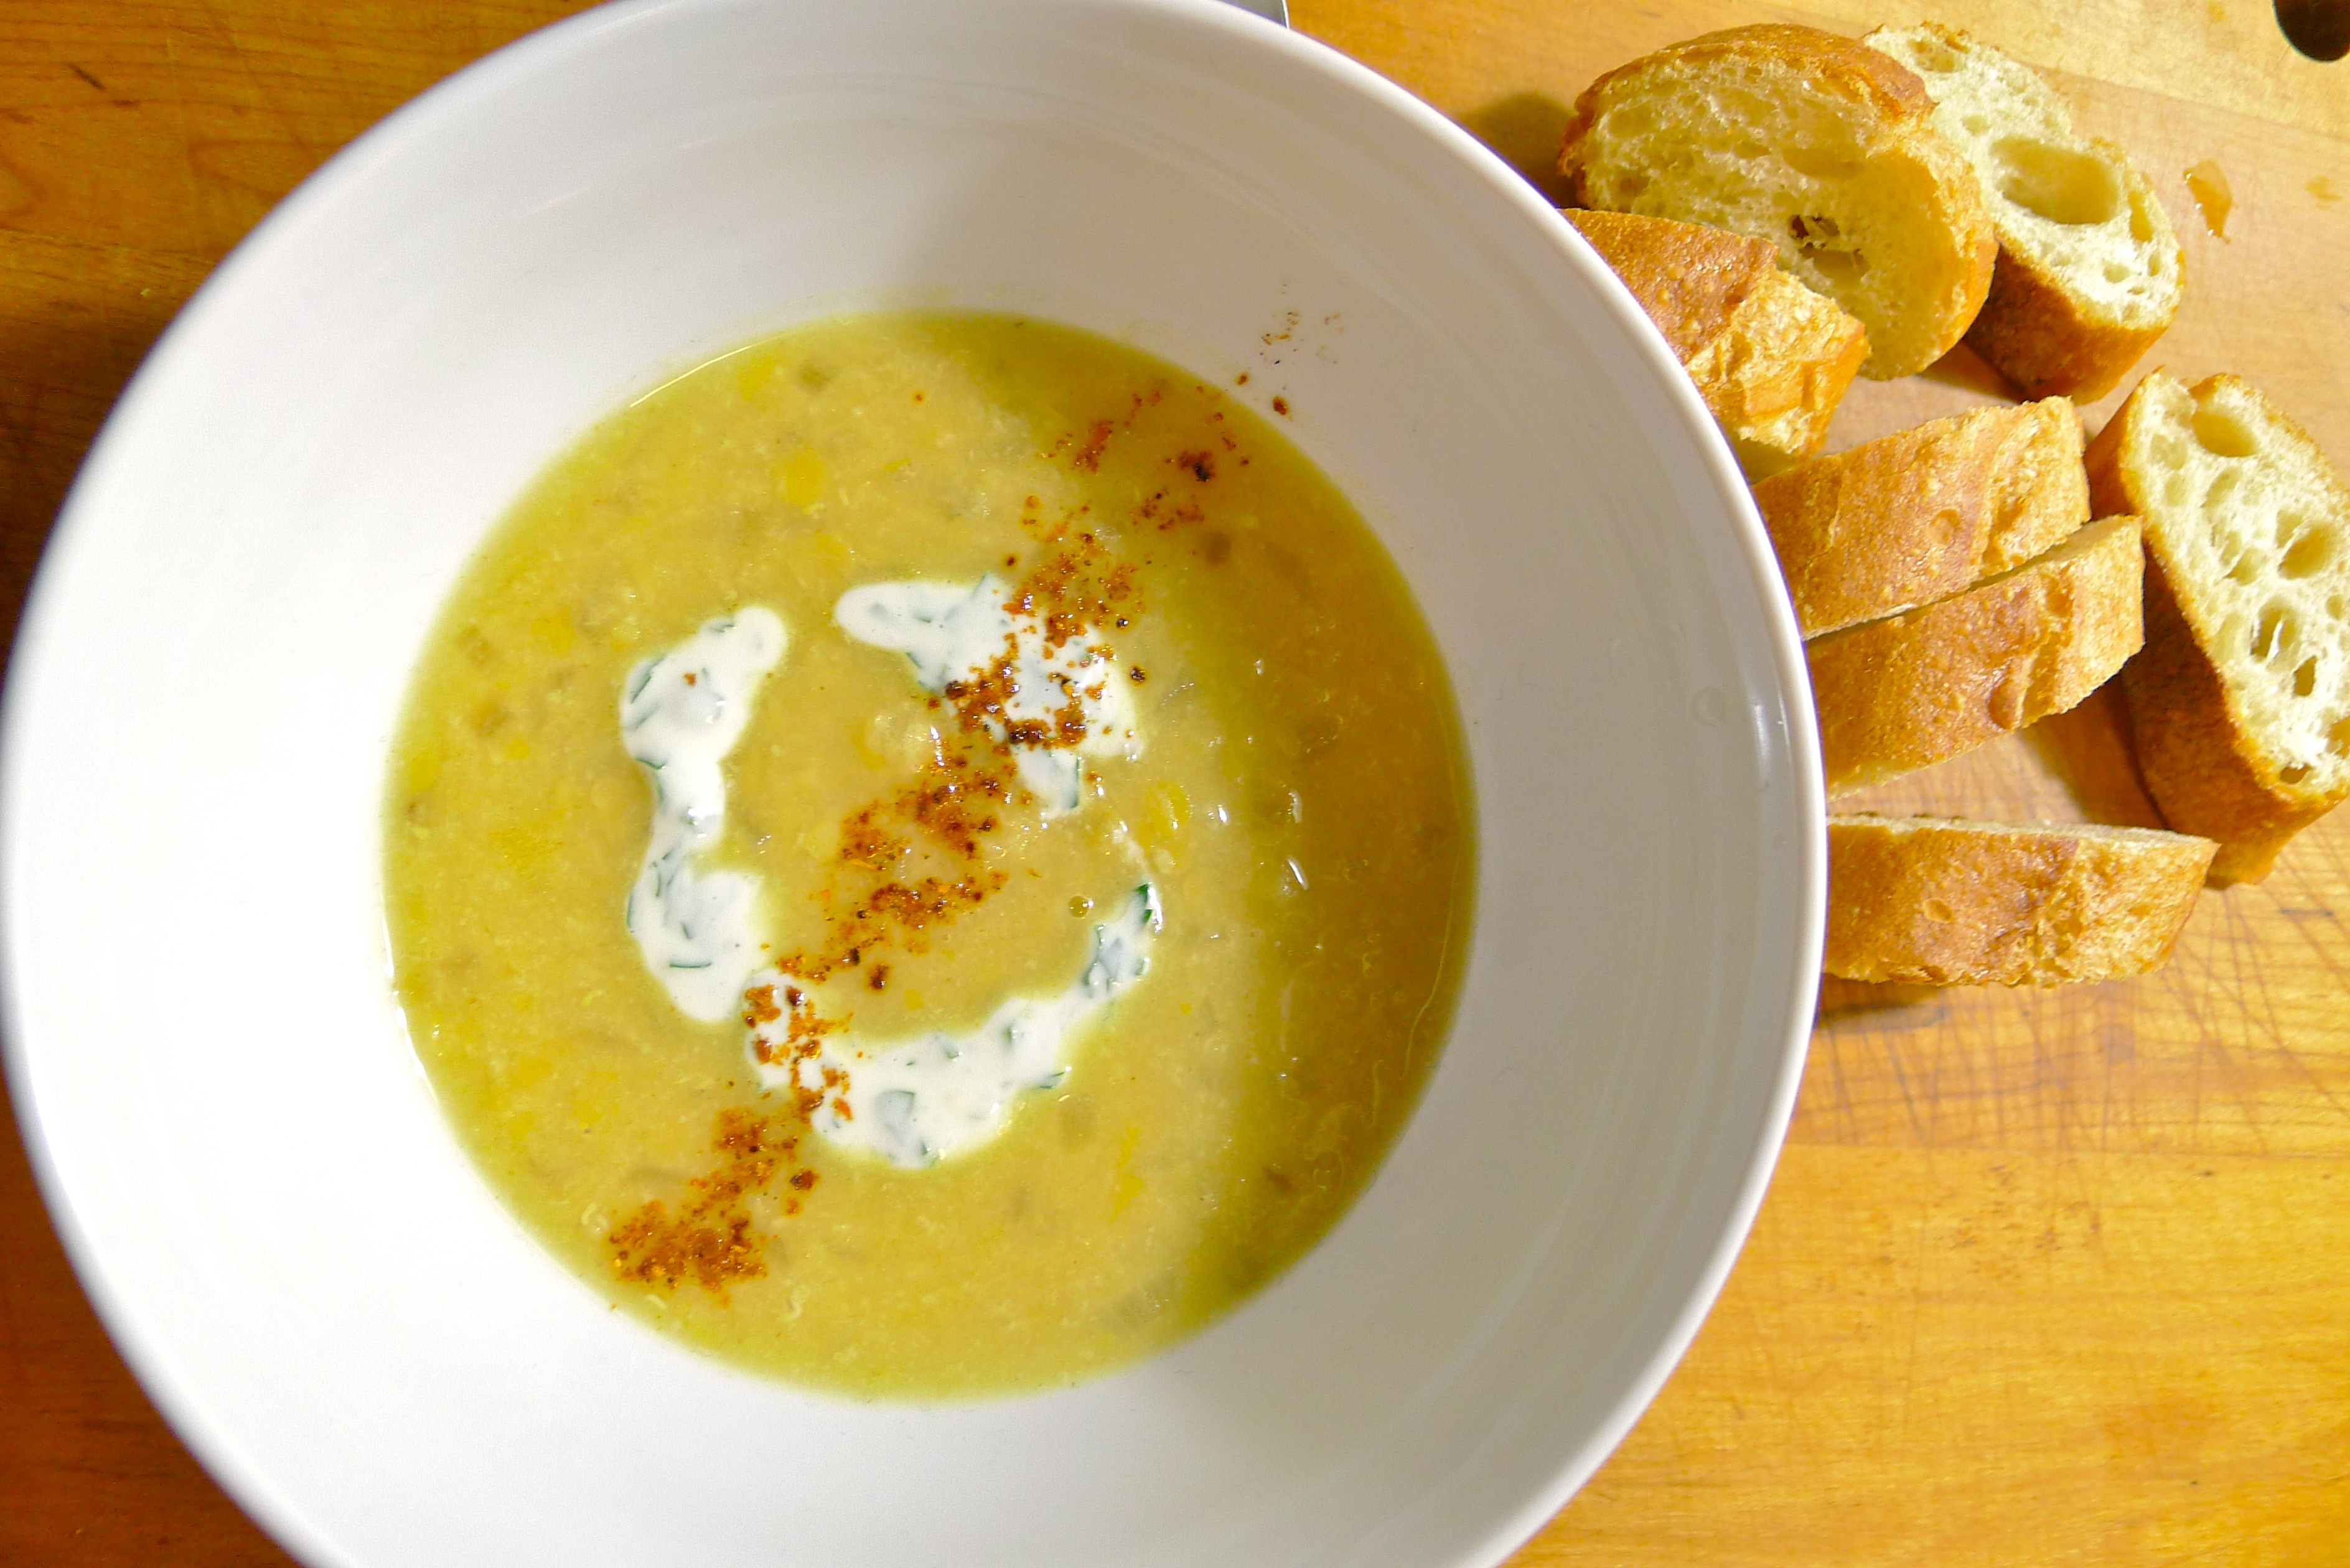 Dean & Deluca's Middle Eastern Red Lentil Soup with Yogurt ...